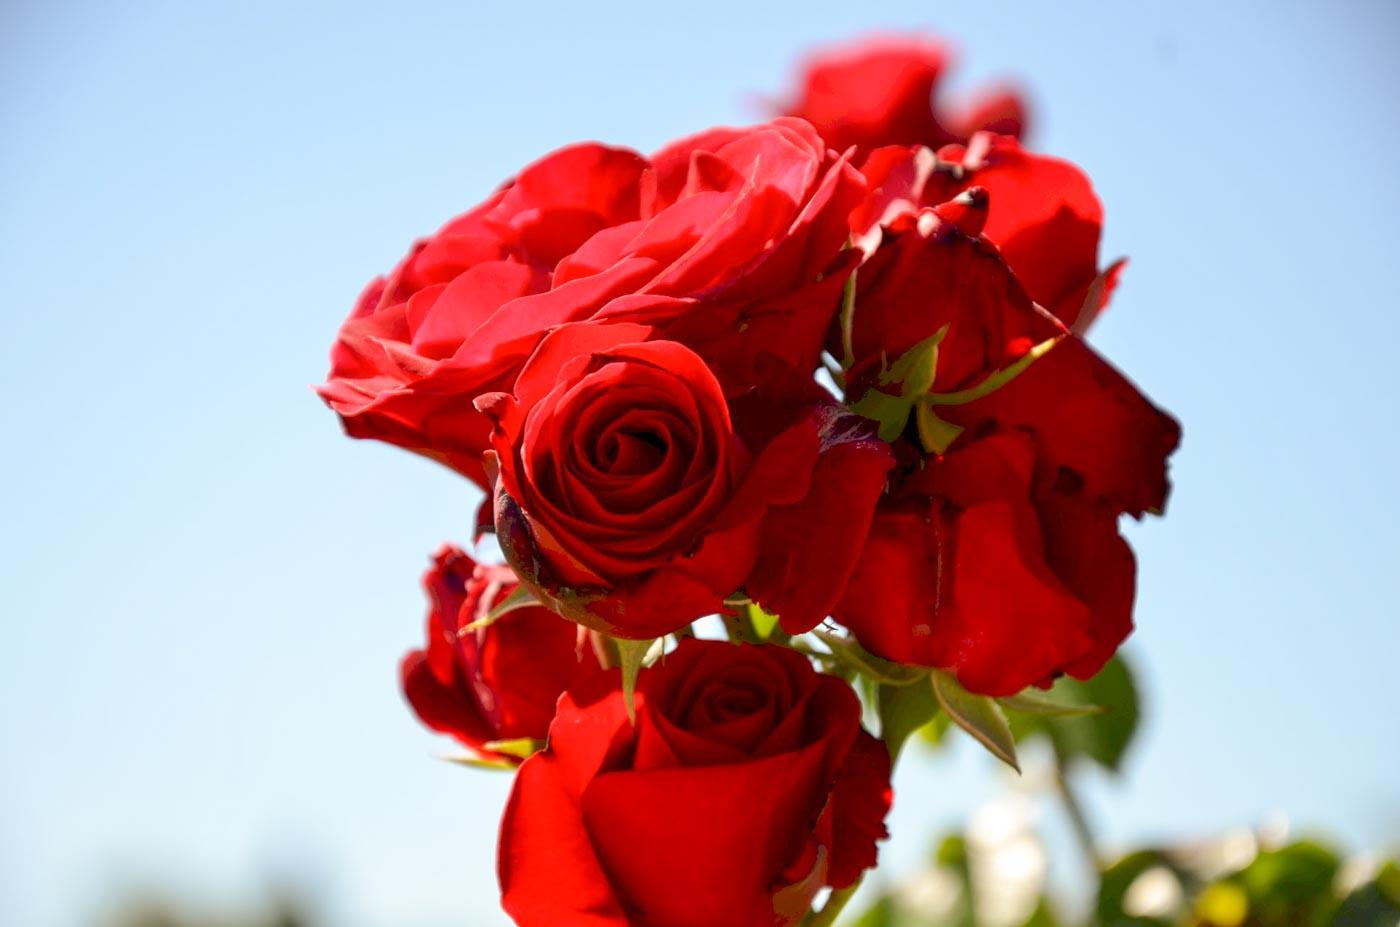 Giardino giapponese di Parigi particolare delle rose rosse